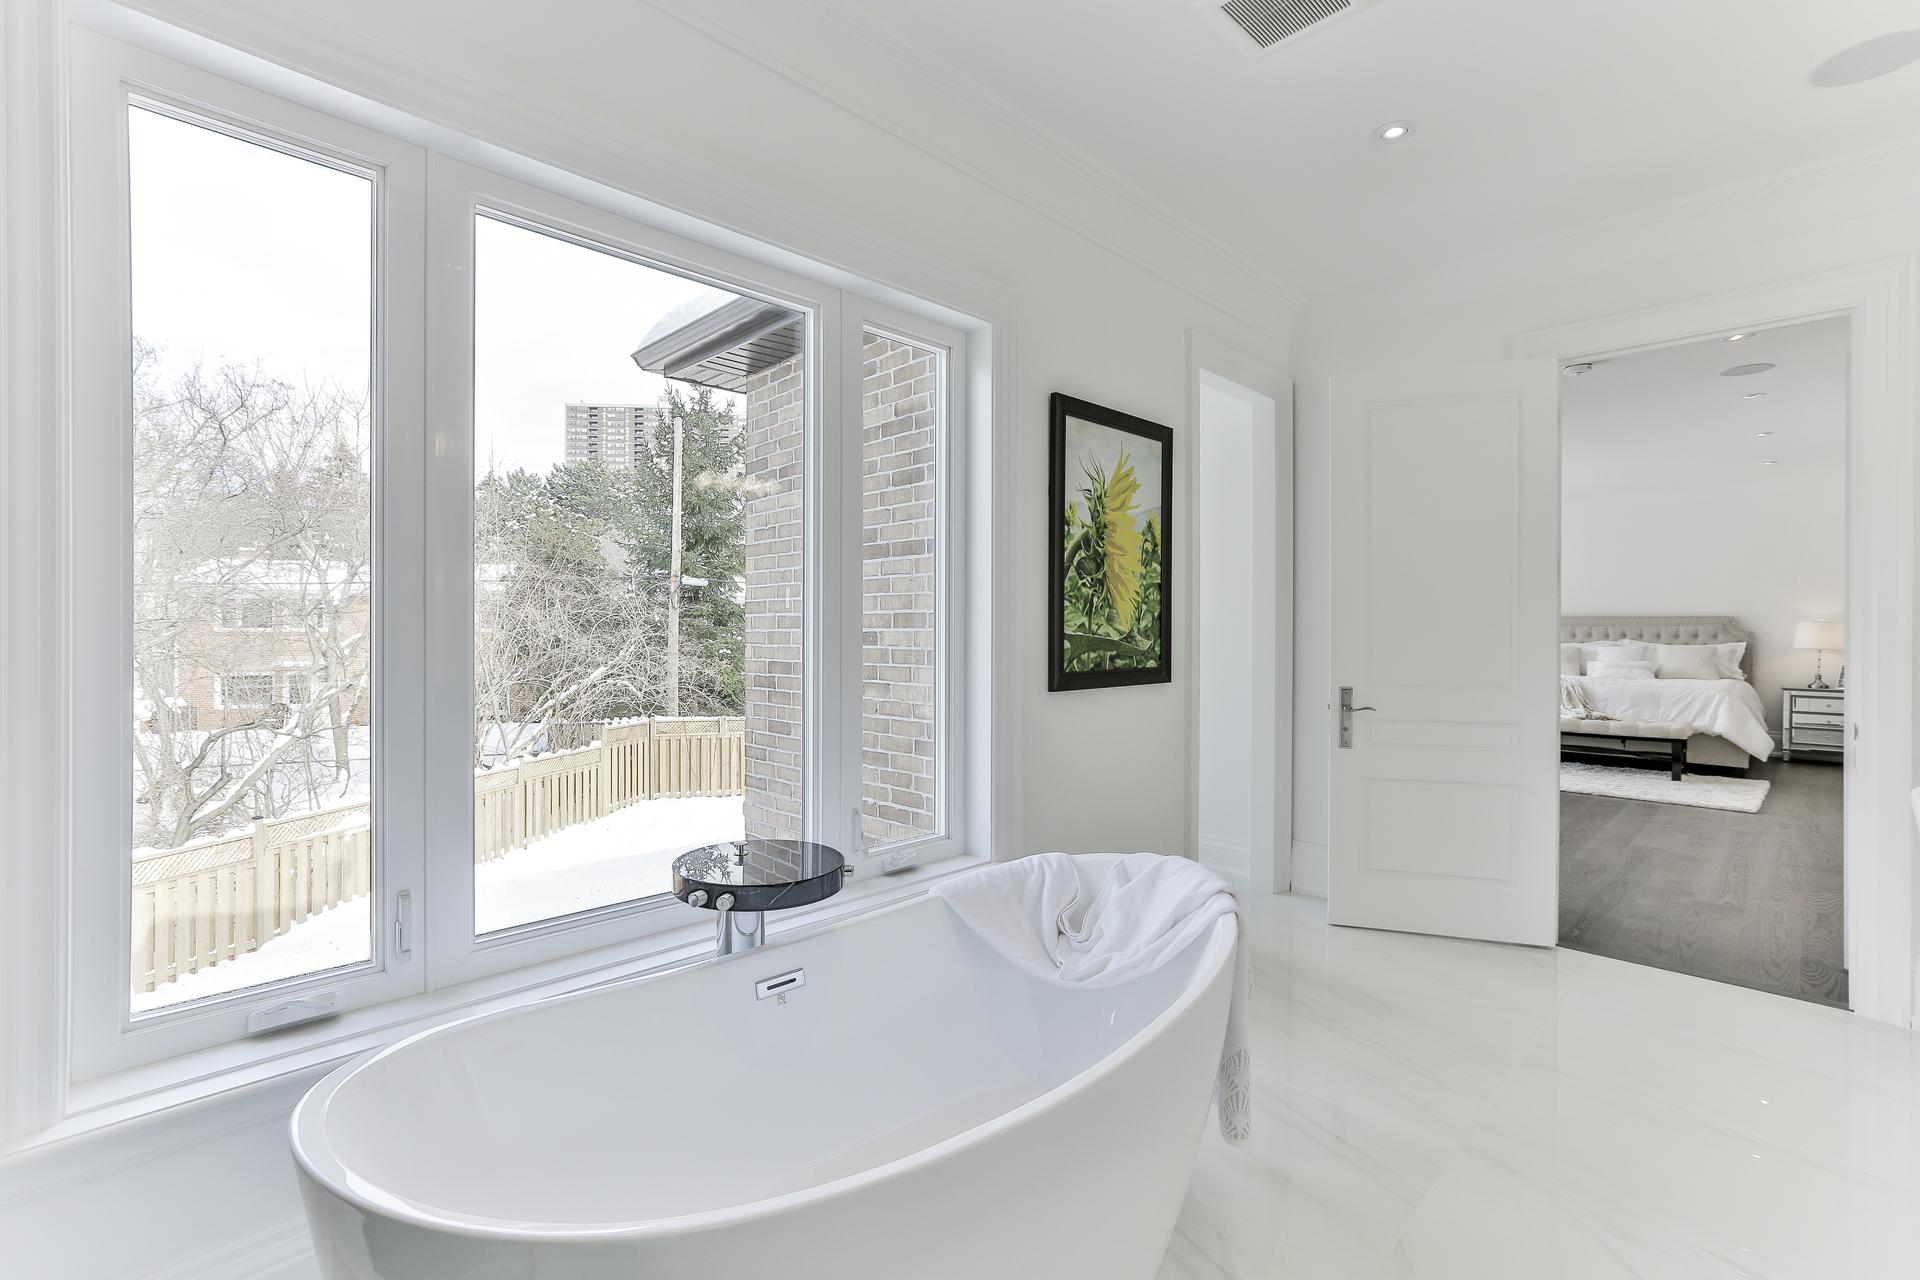 6 Piece Ensuite Bathroom at 36 Laurentide Drive, Parkwoods-Donalda, Toronto